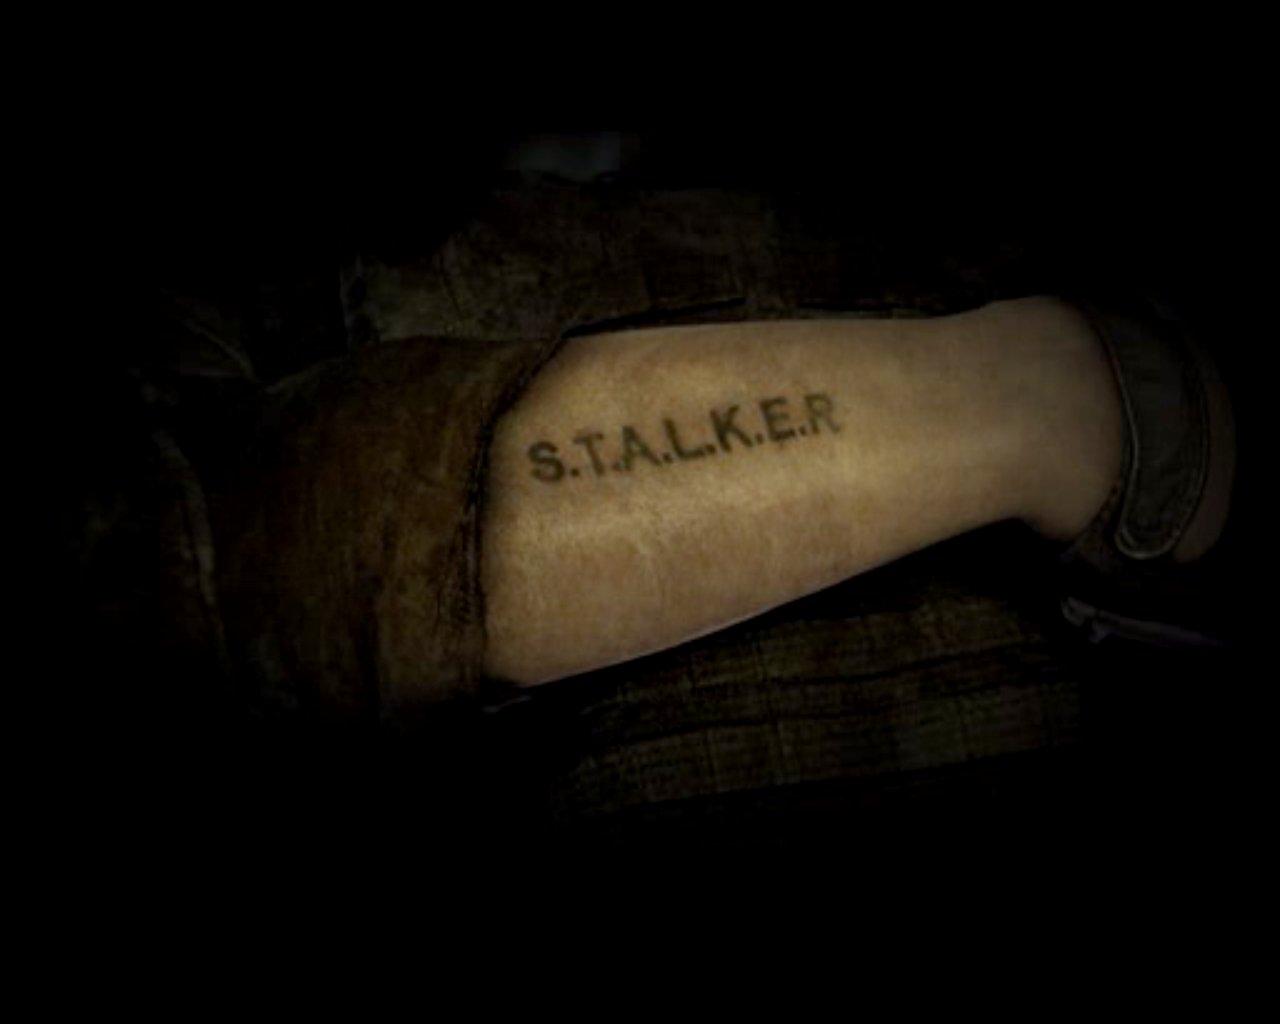 Надпись сталкер для тату